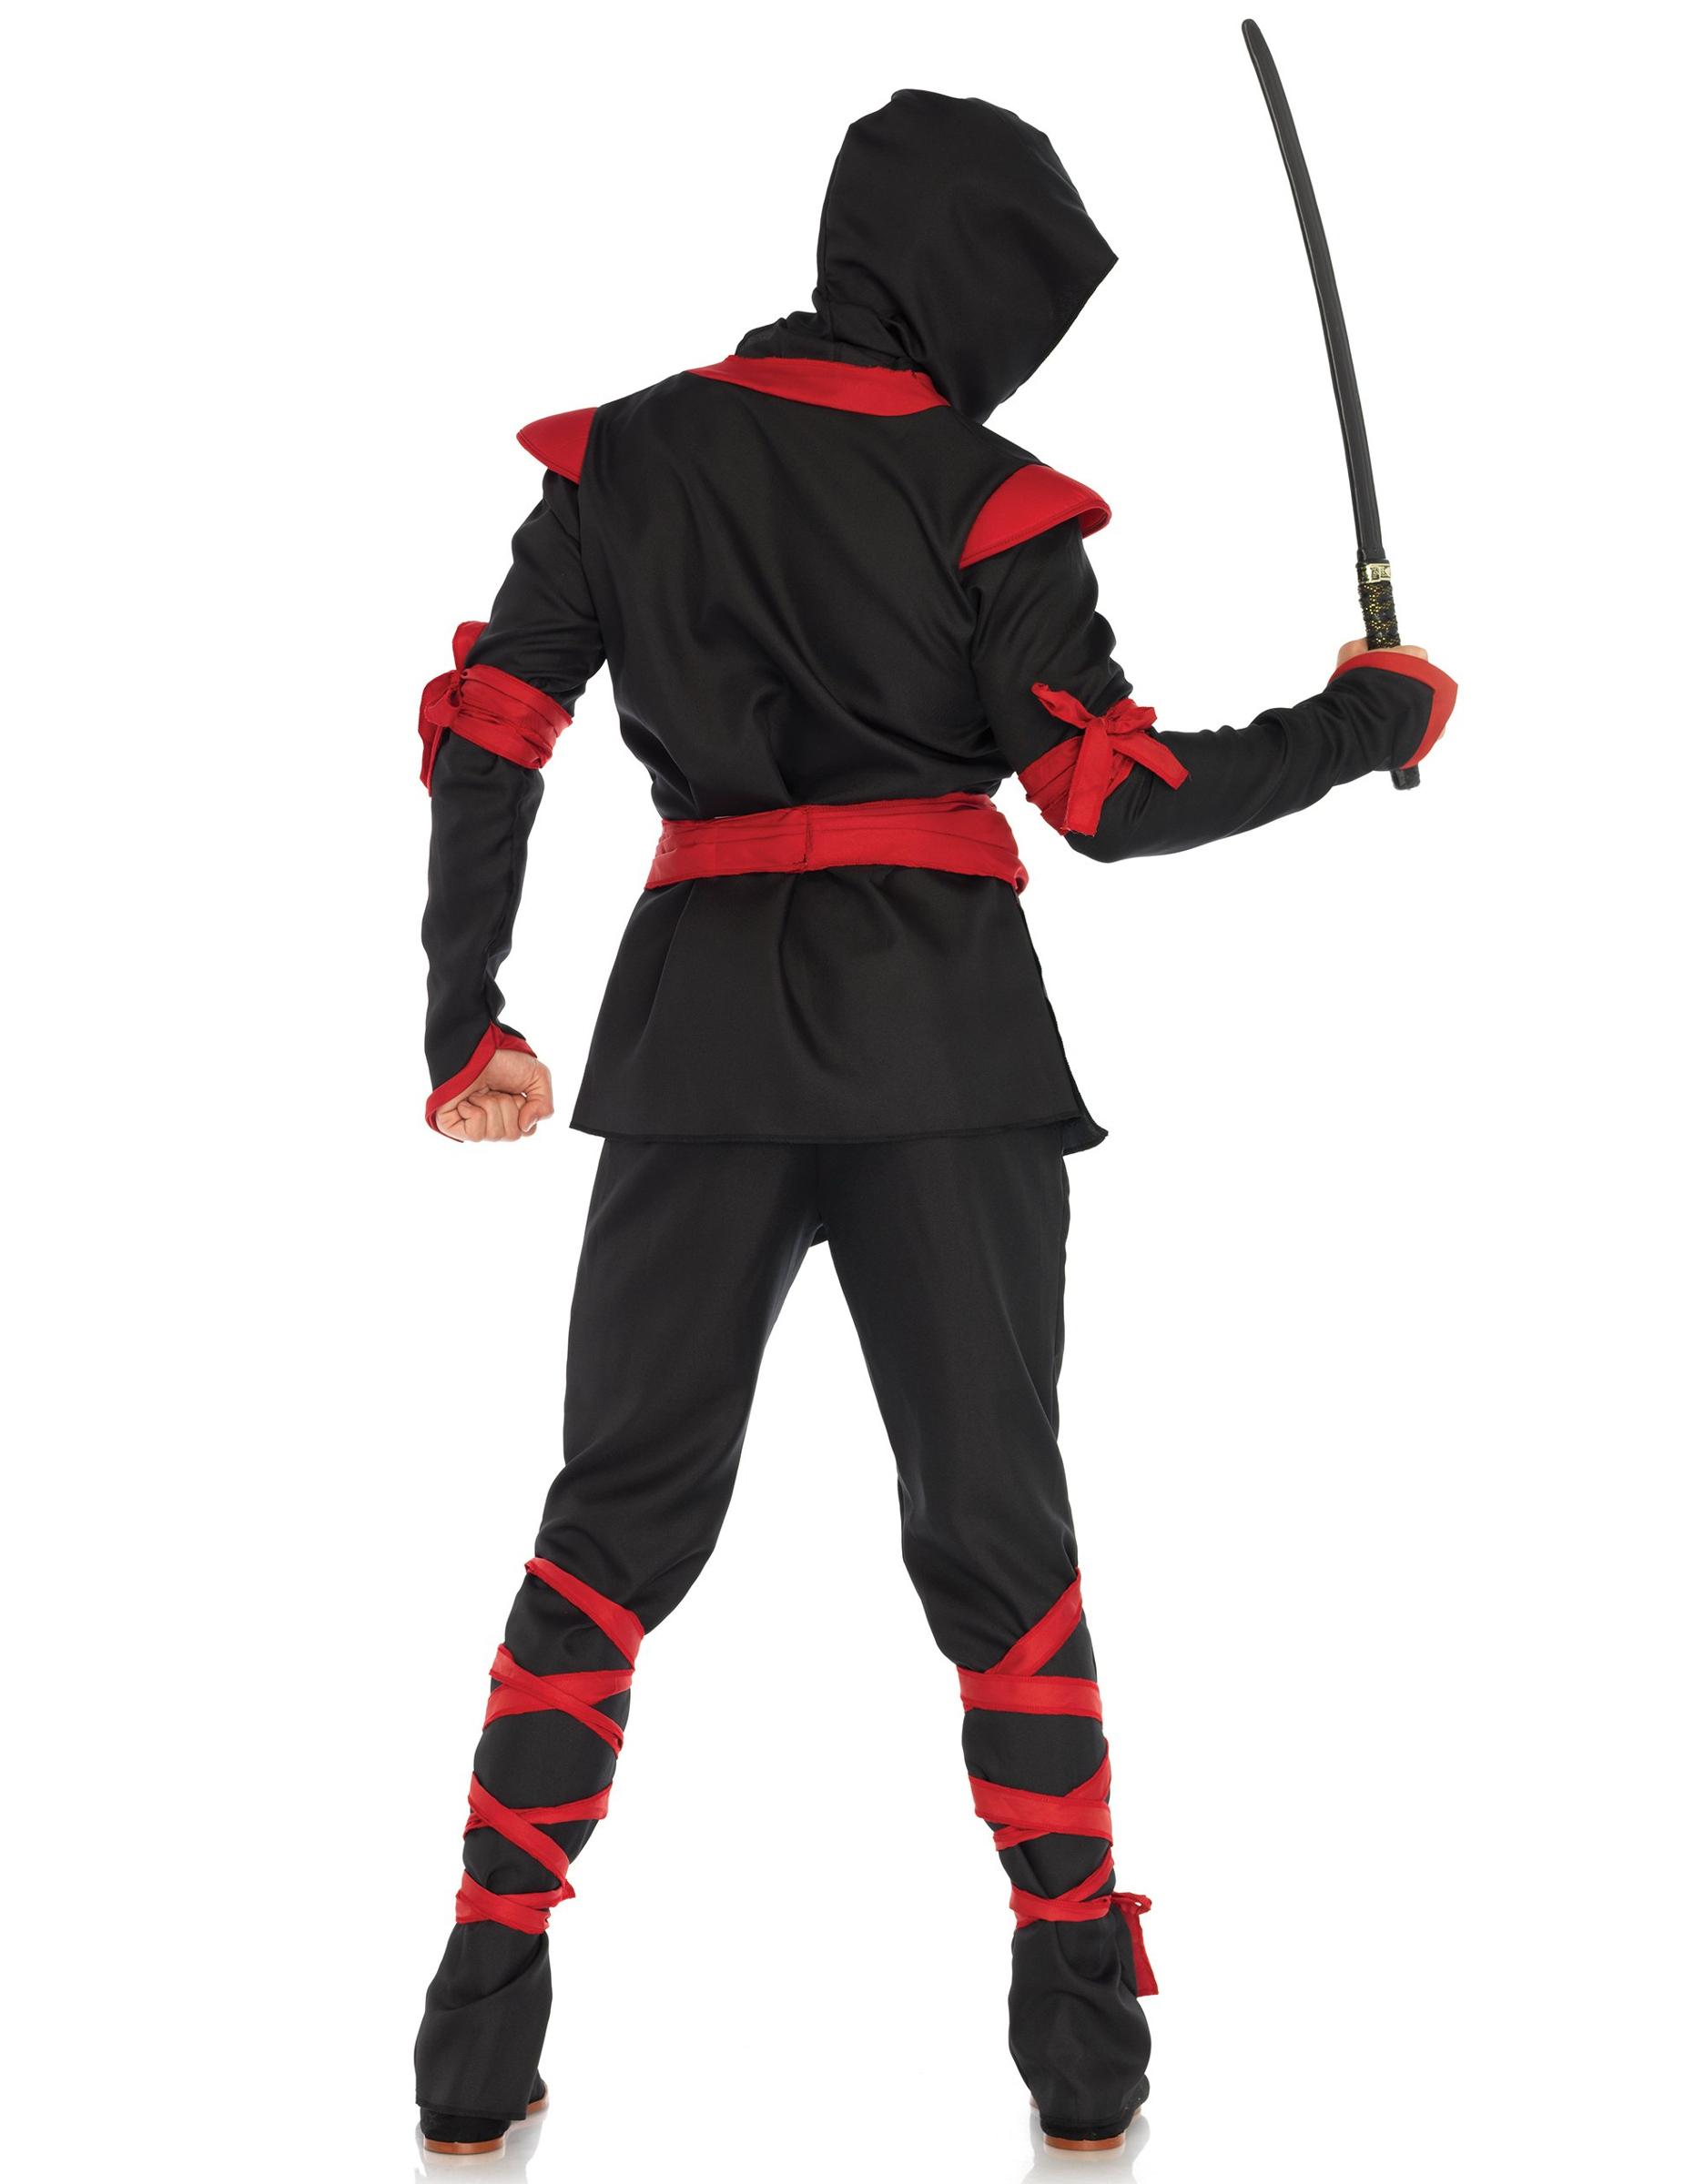 b6722ea4ffb8f Déguisement ninja assassin homme   Deguise-toi